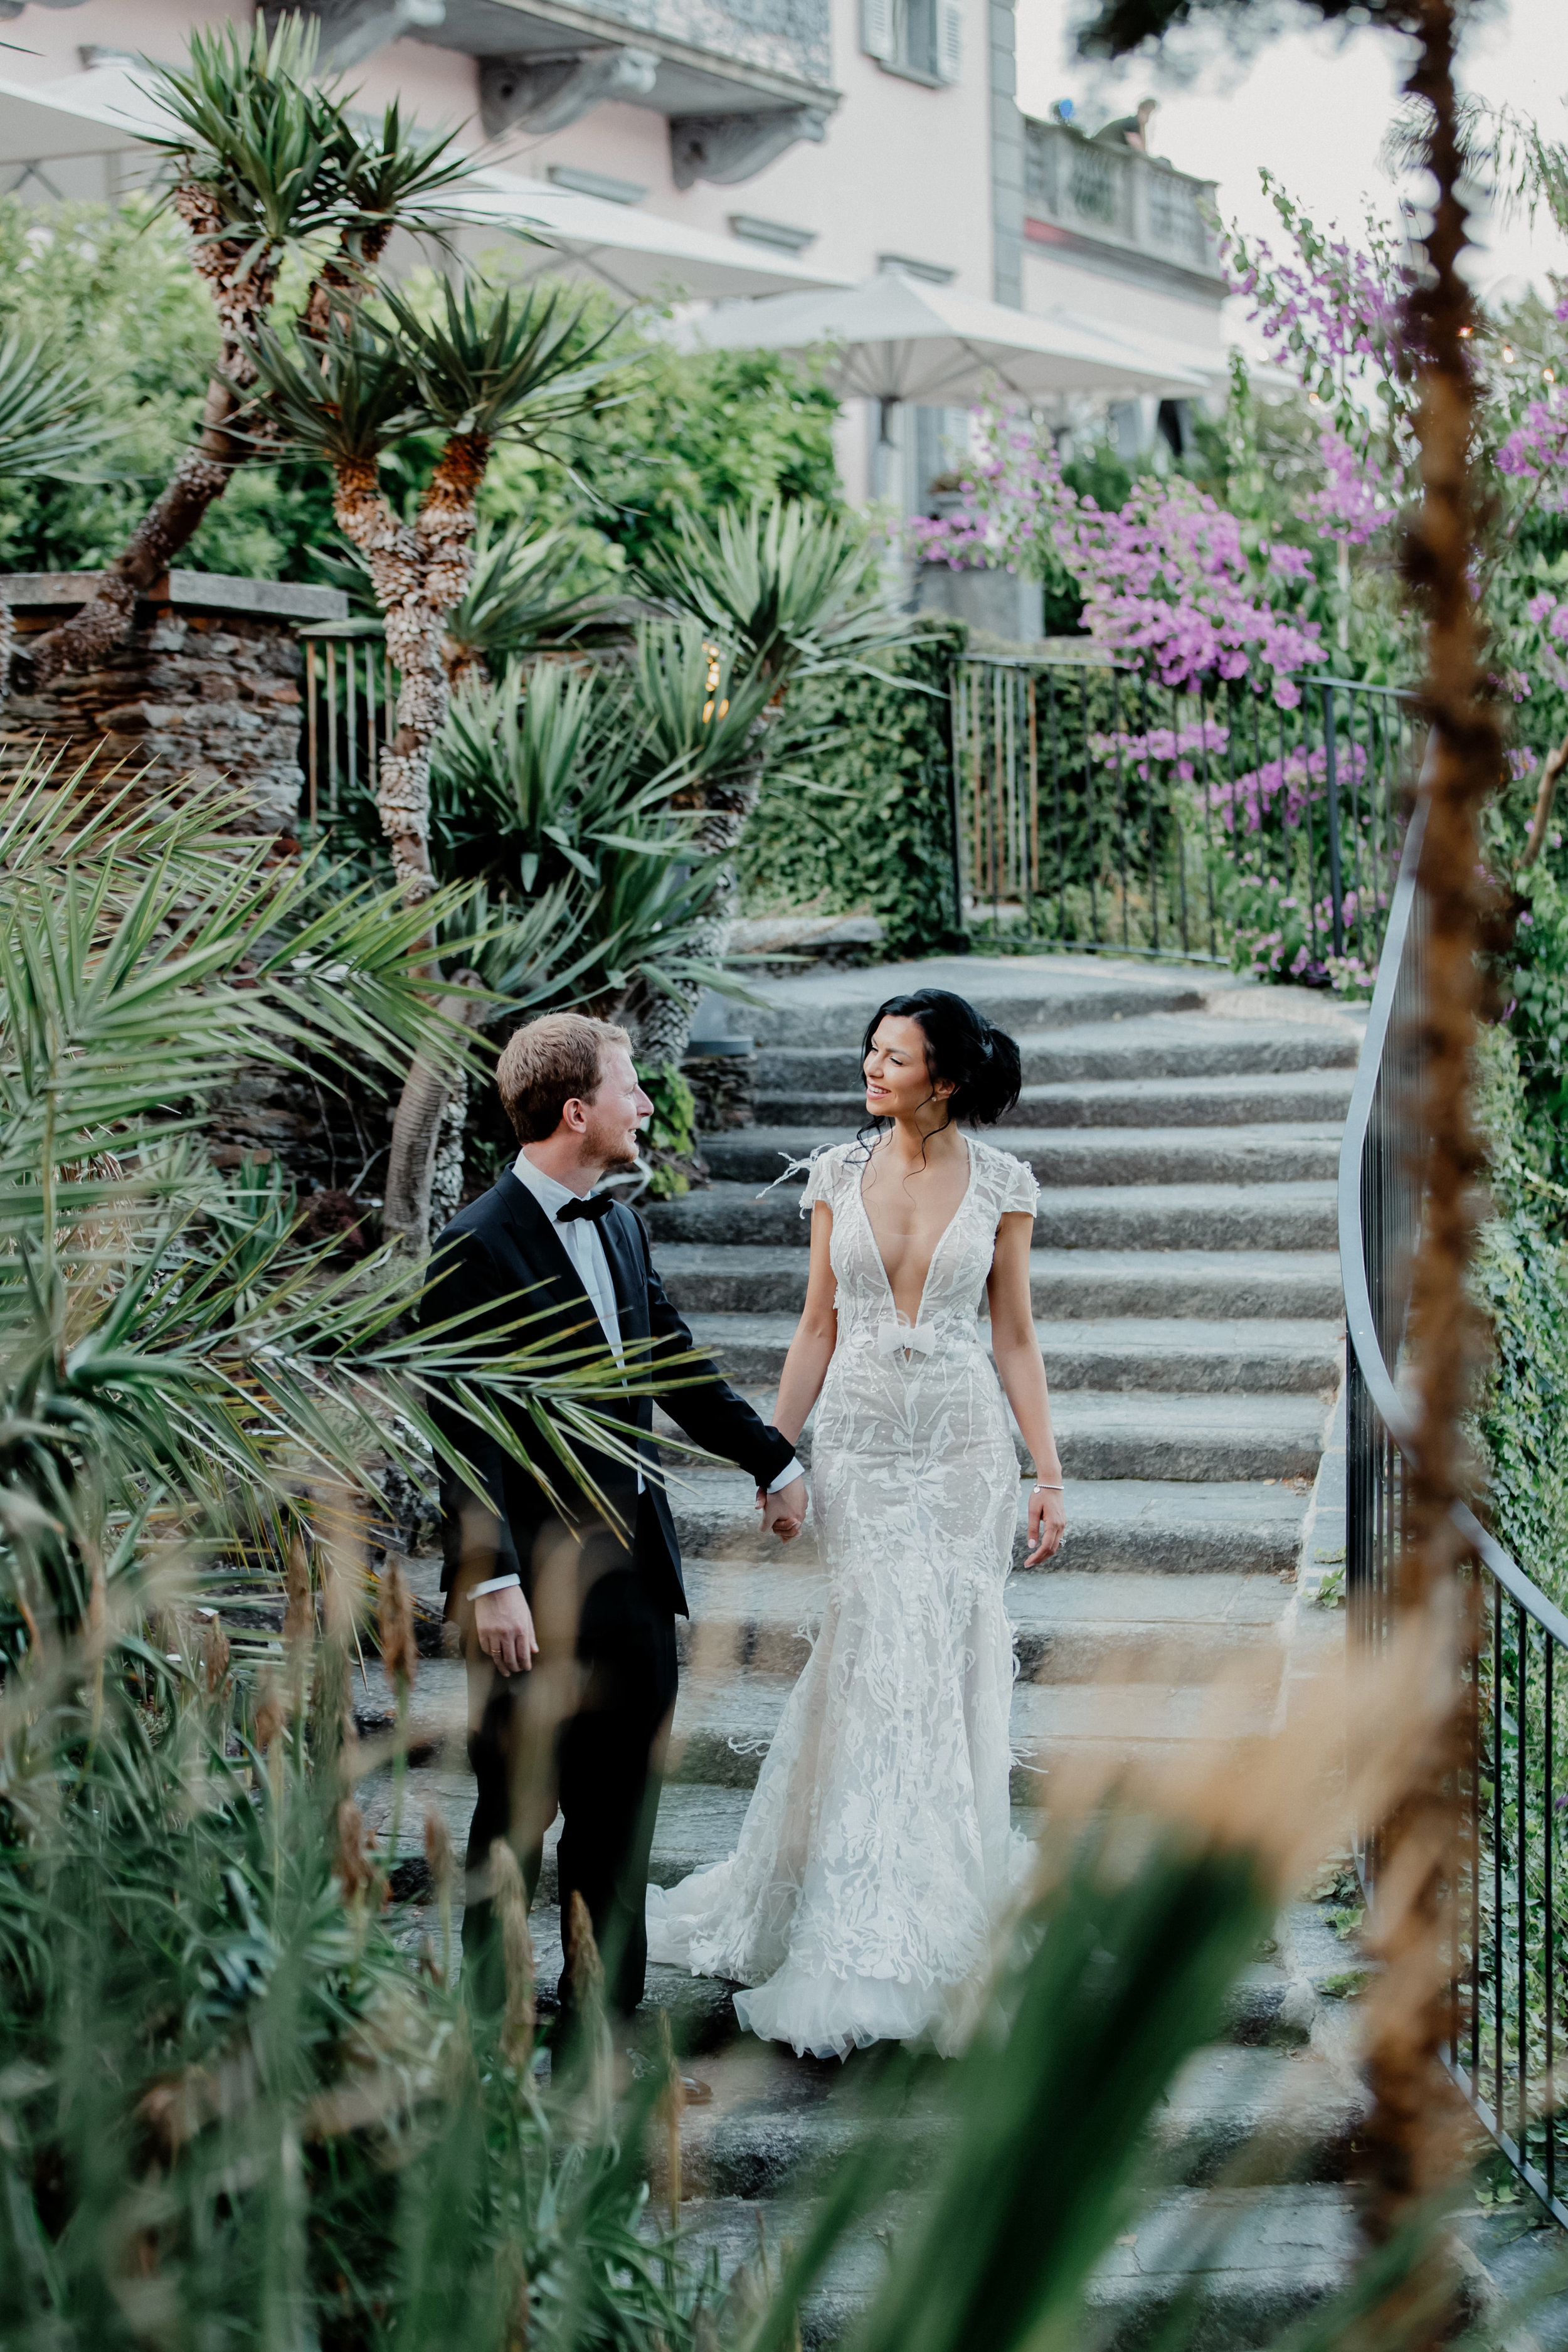 180707-preview-098-Marina-Fadeeva-wedding-photographer.jpg